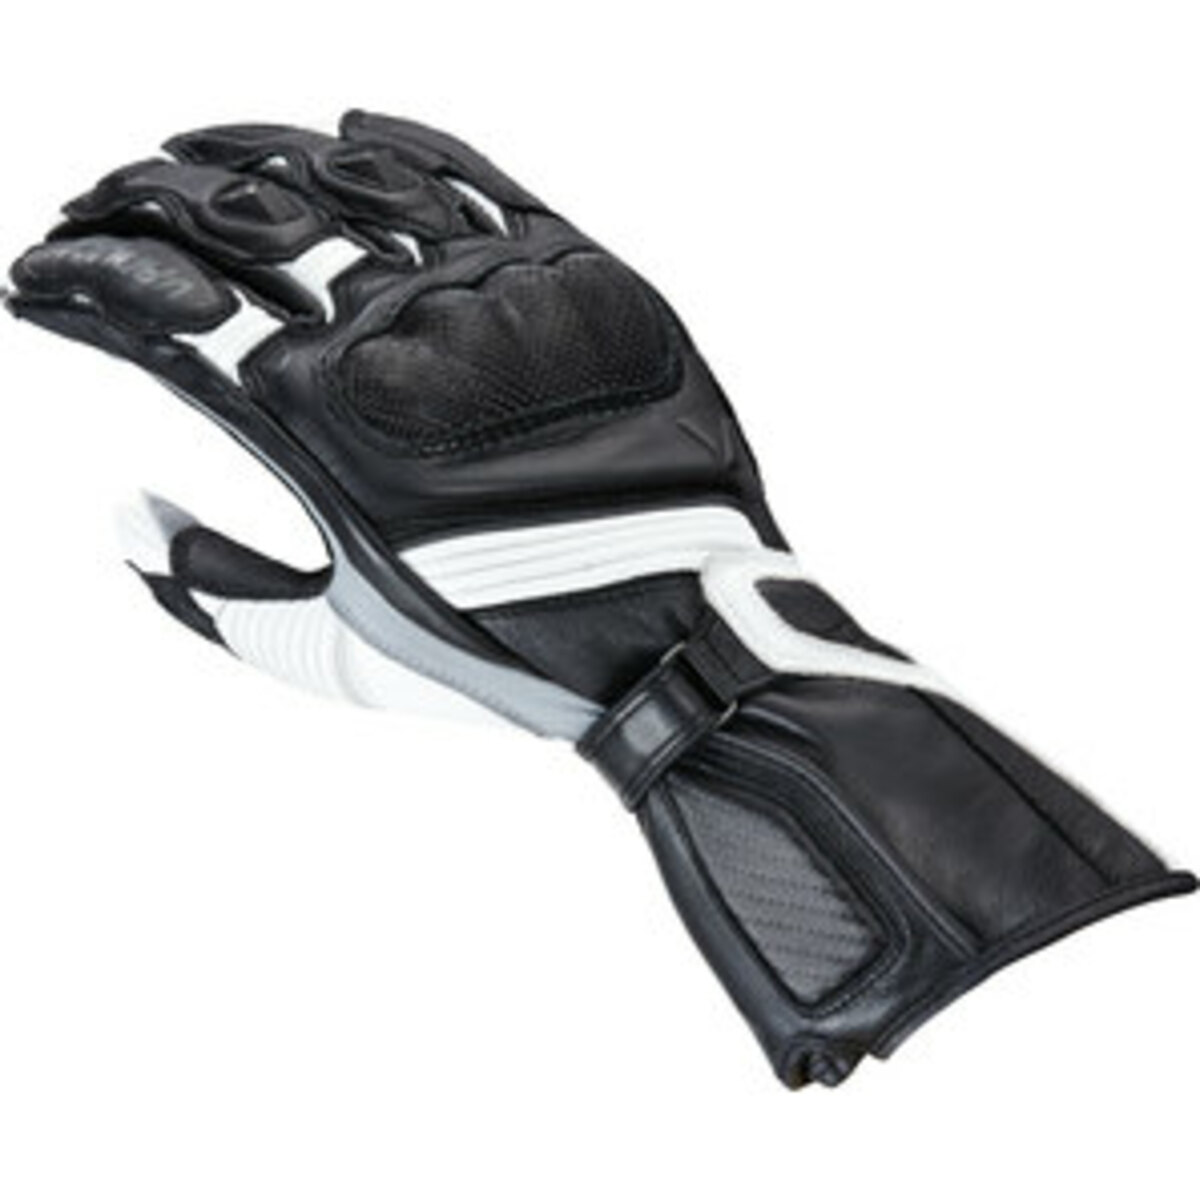 Bild 1 von Vanucci Profi III Handschuhe